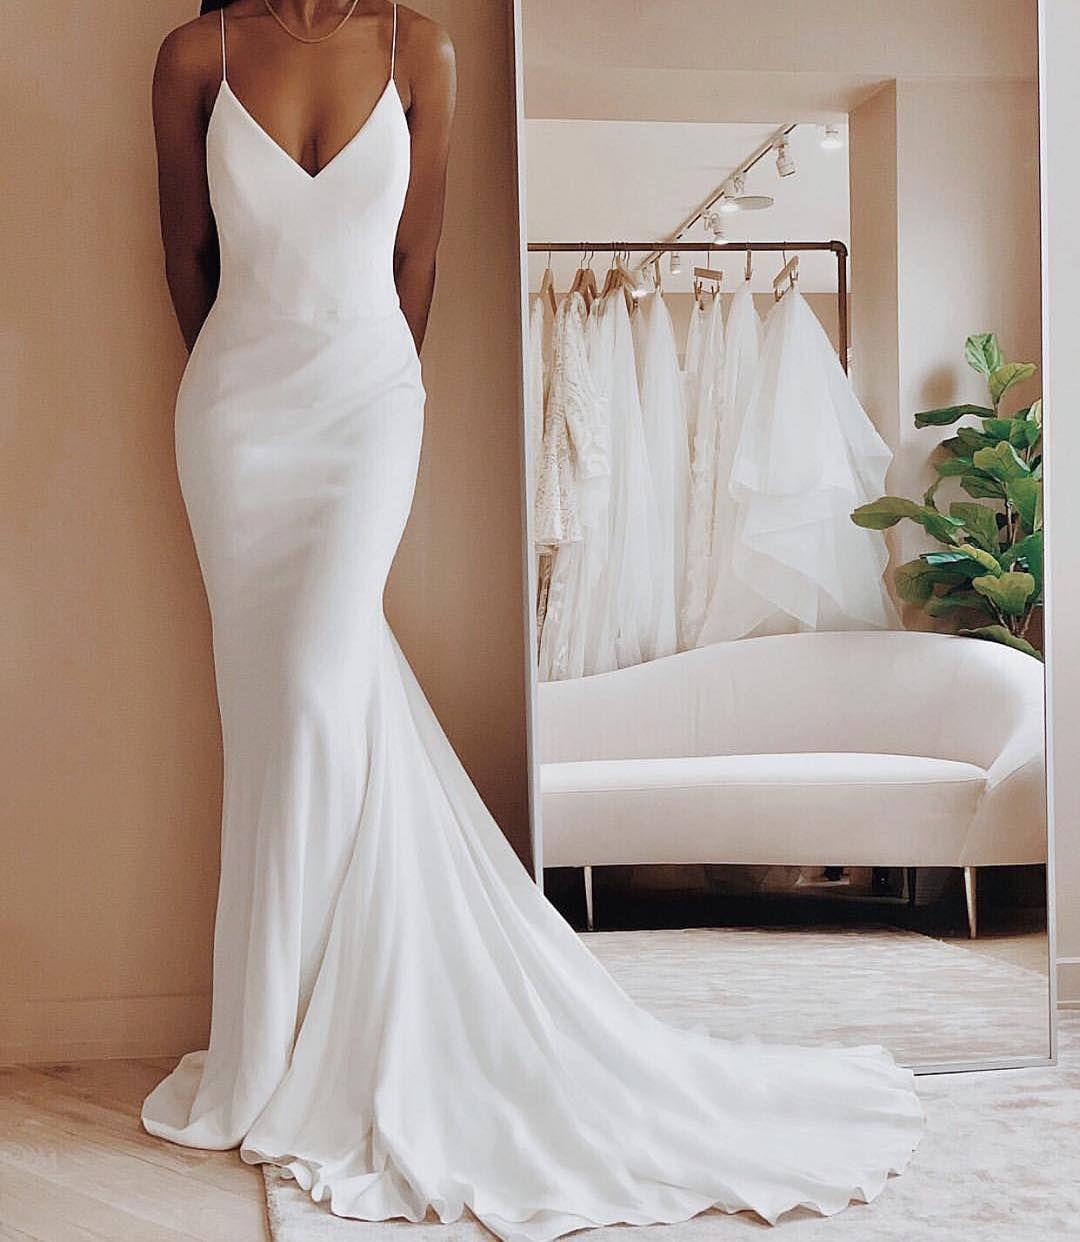 32 Beach Wedding Dresses Perfect For A Destination Wedding, simple wedding dress…